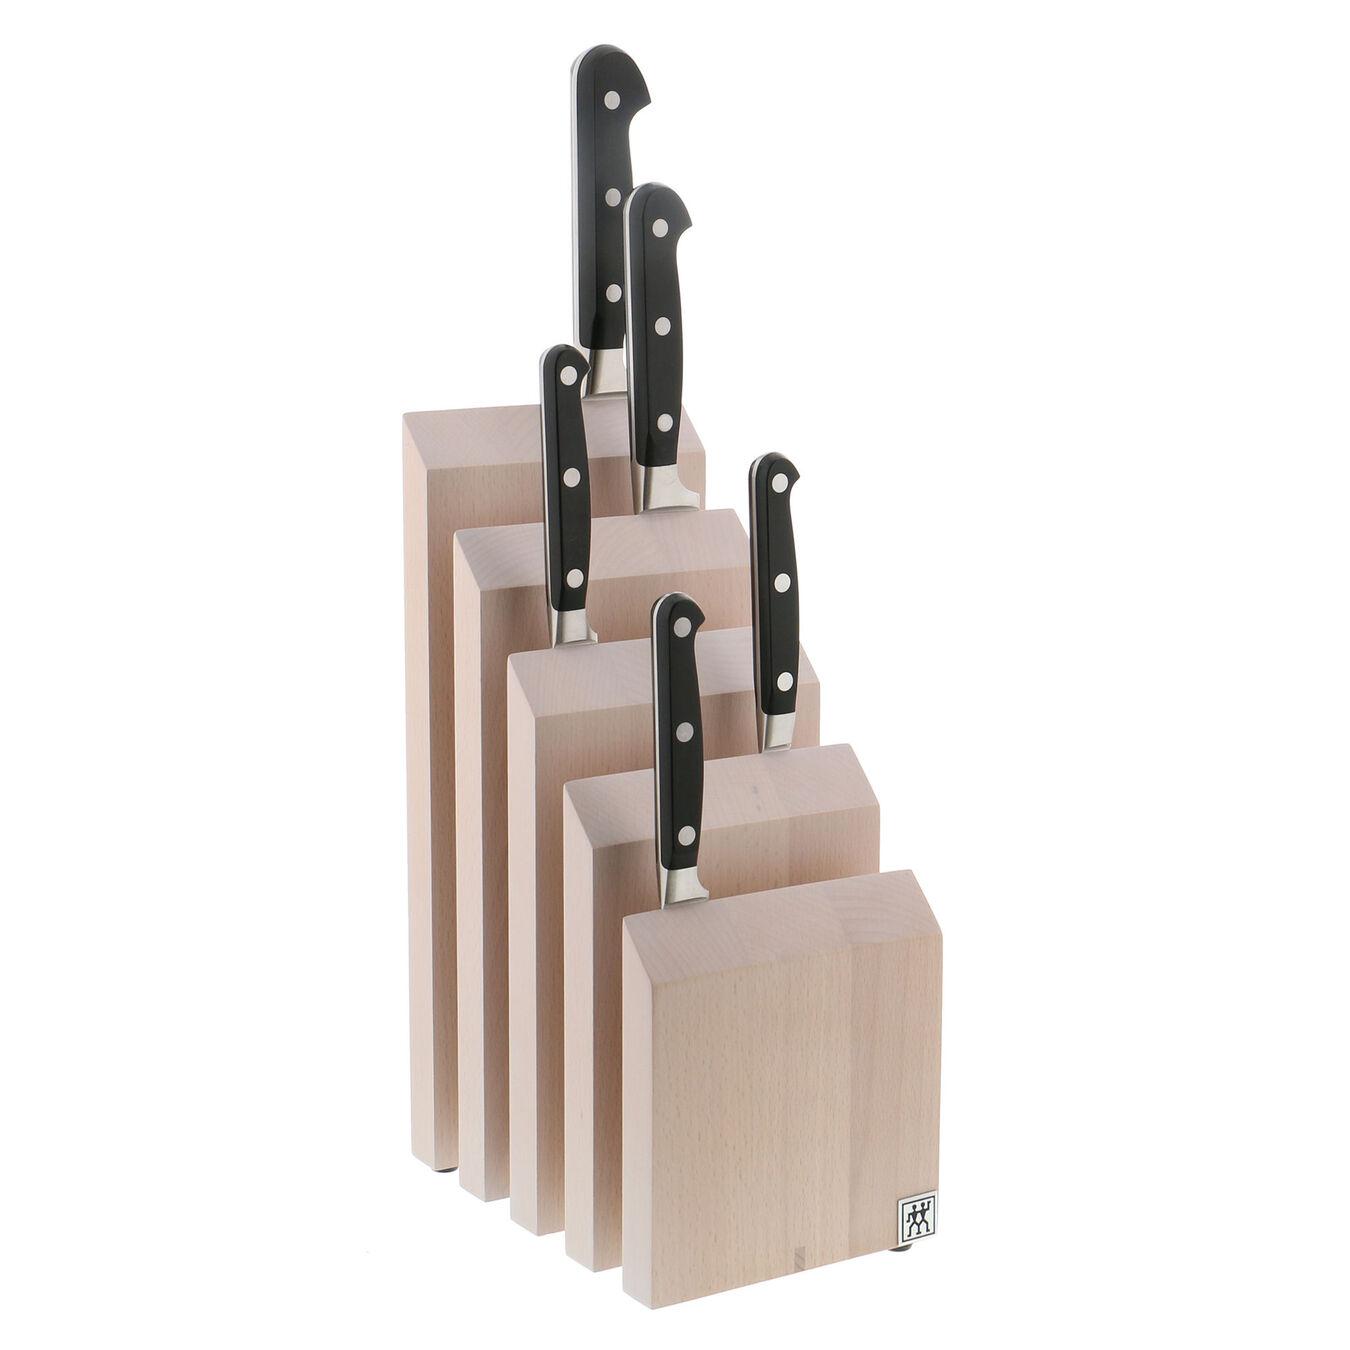 Upright Magnetic Knife Block - White-Colored Beechwood,,large 2